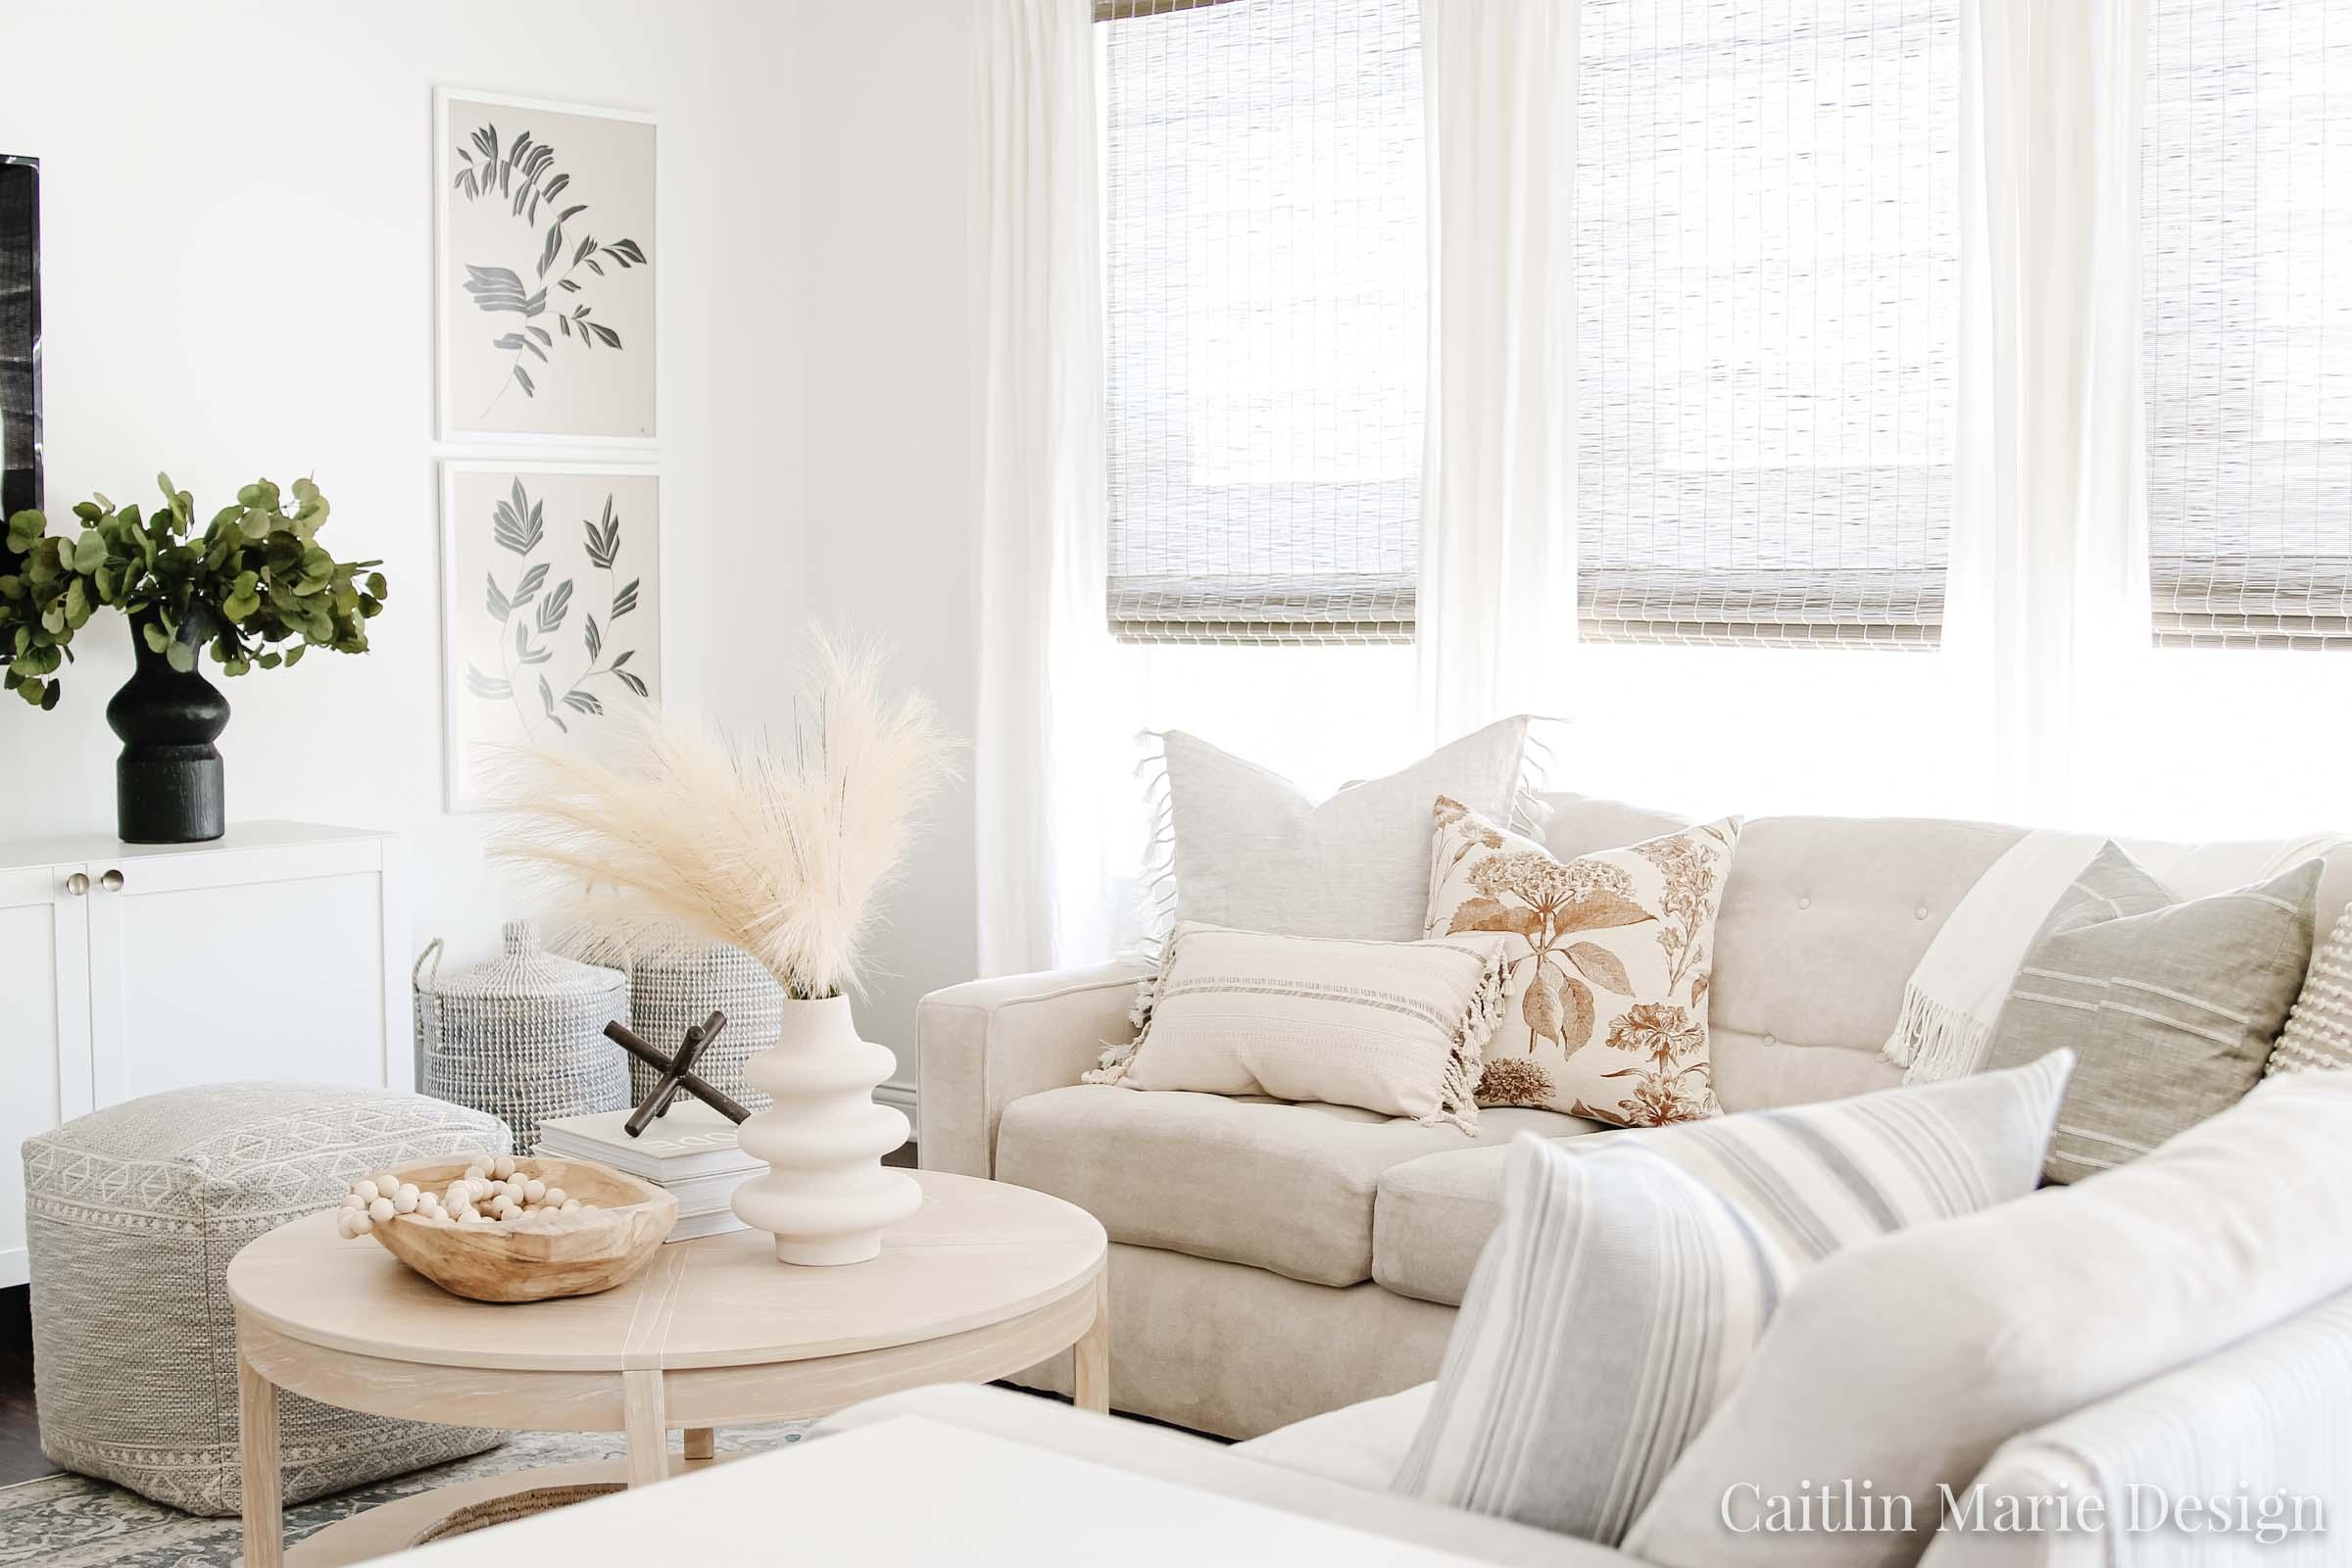 Minimalist Fall Decor | Fall Home Tour 2020 | modern traditional living room, cozy living room, aesthetic decor, modern coastal, round coffee table, fall throw pillows